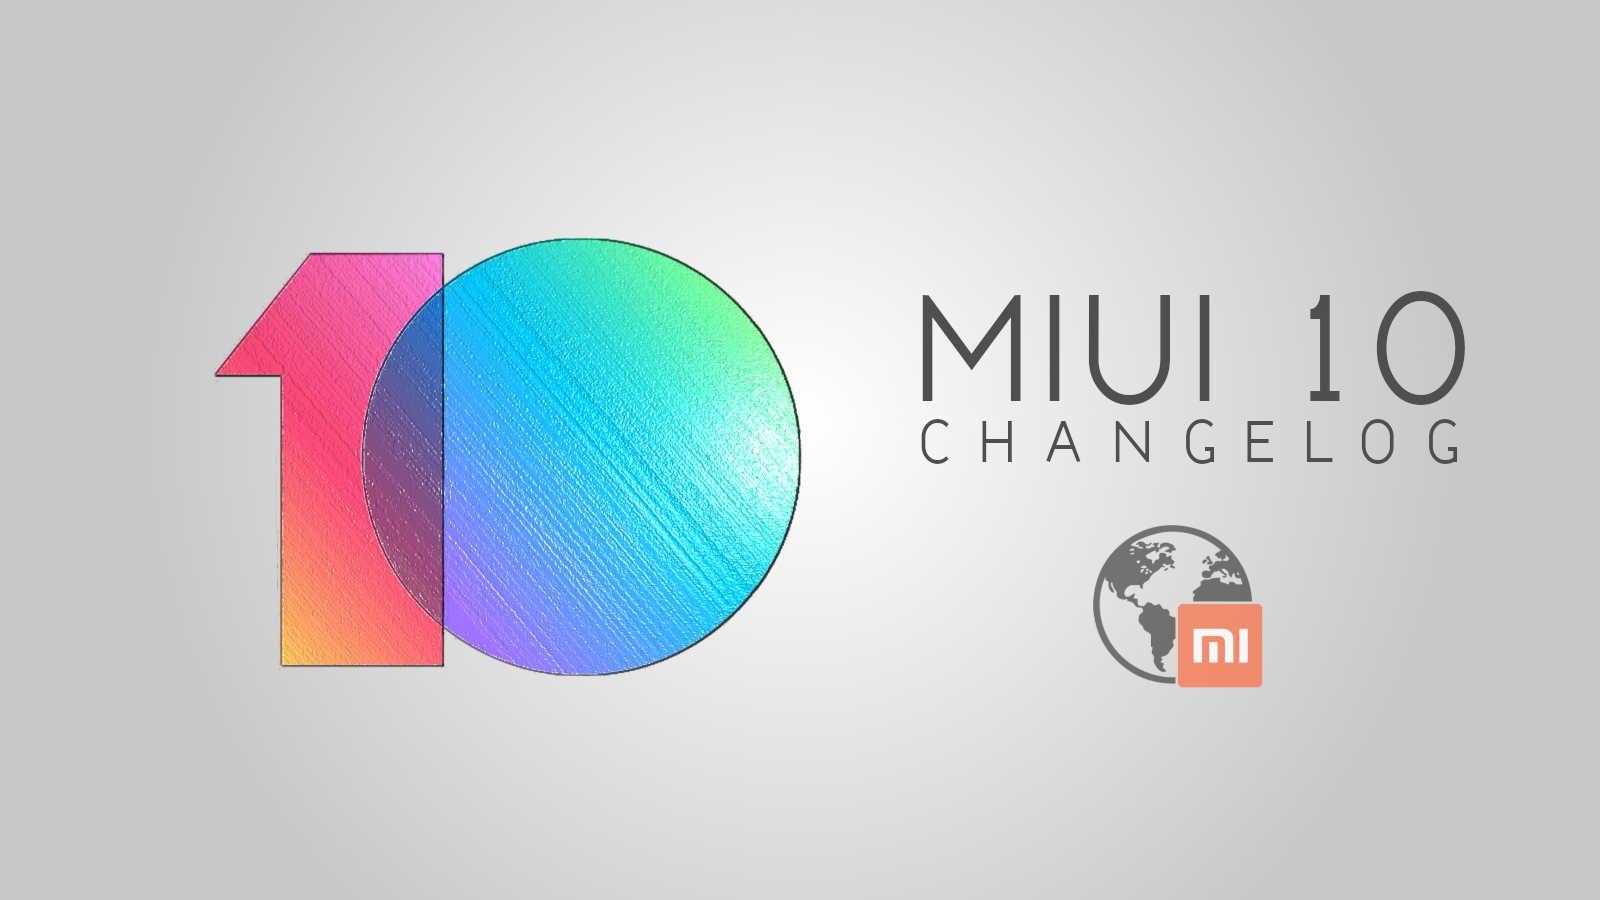 MiUI 9 8 29 Changelog - Last version of MIUI 10 - mi-globe com